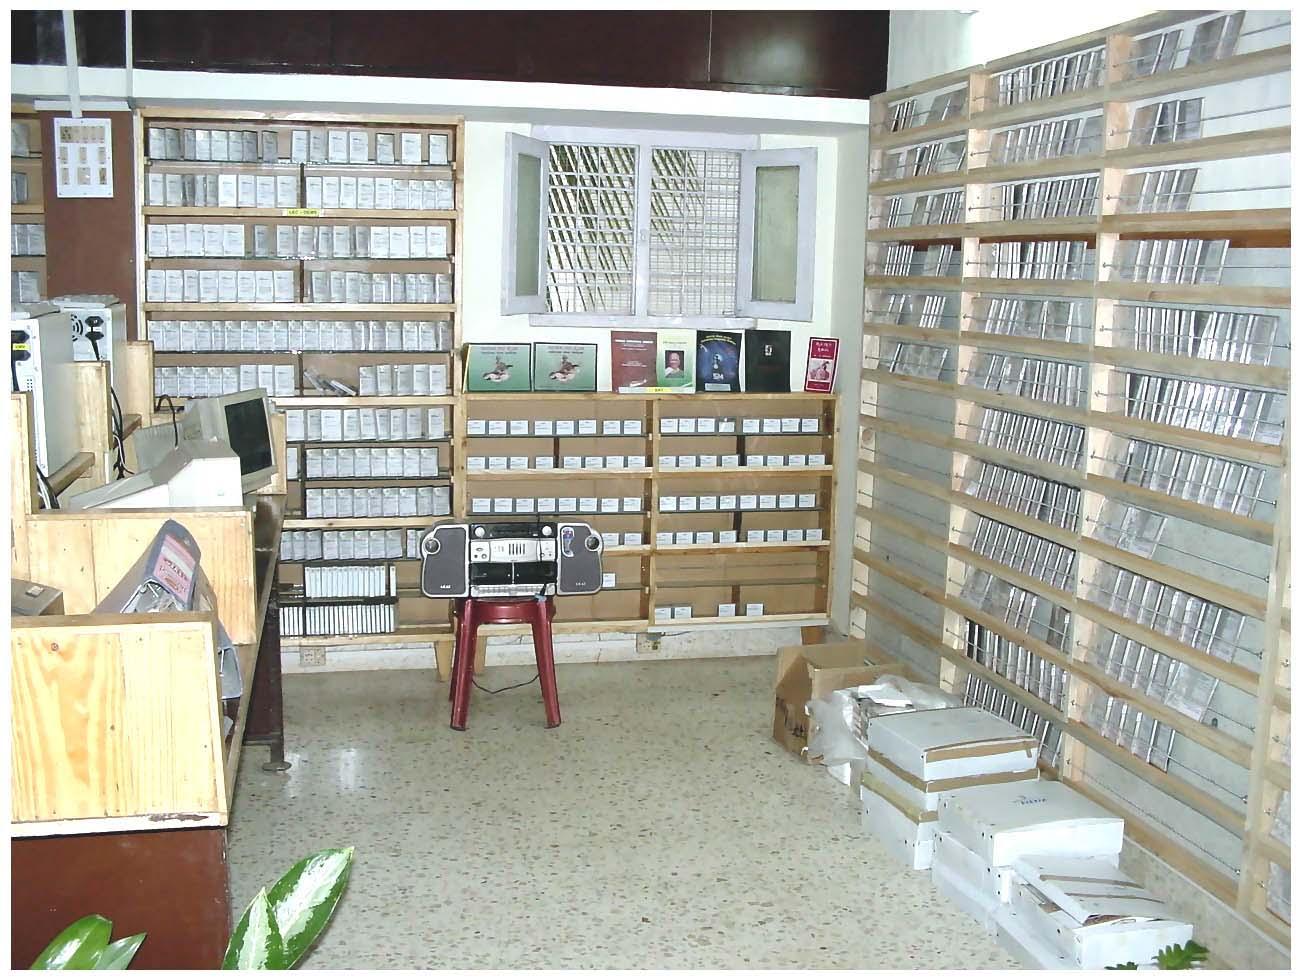 Lib-cd section